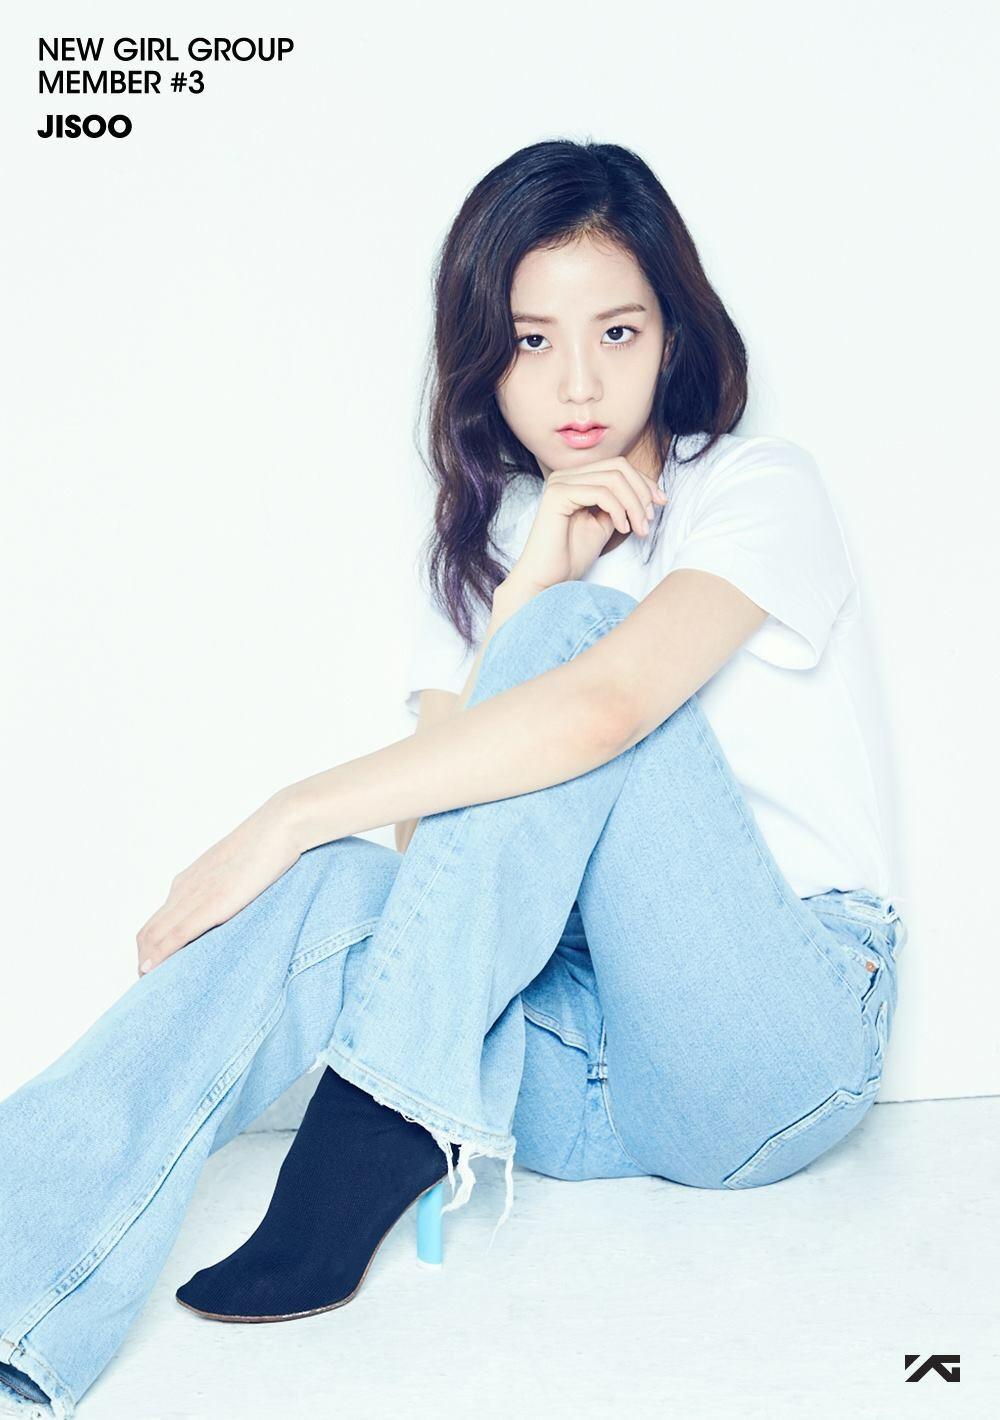 BLACK rosado, rosa | Member #3 - Jisoo